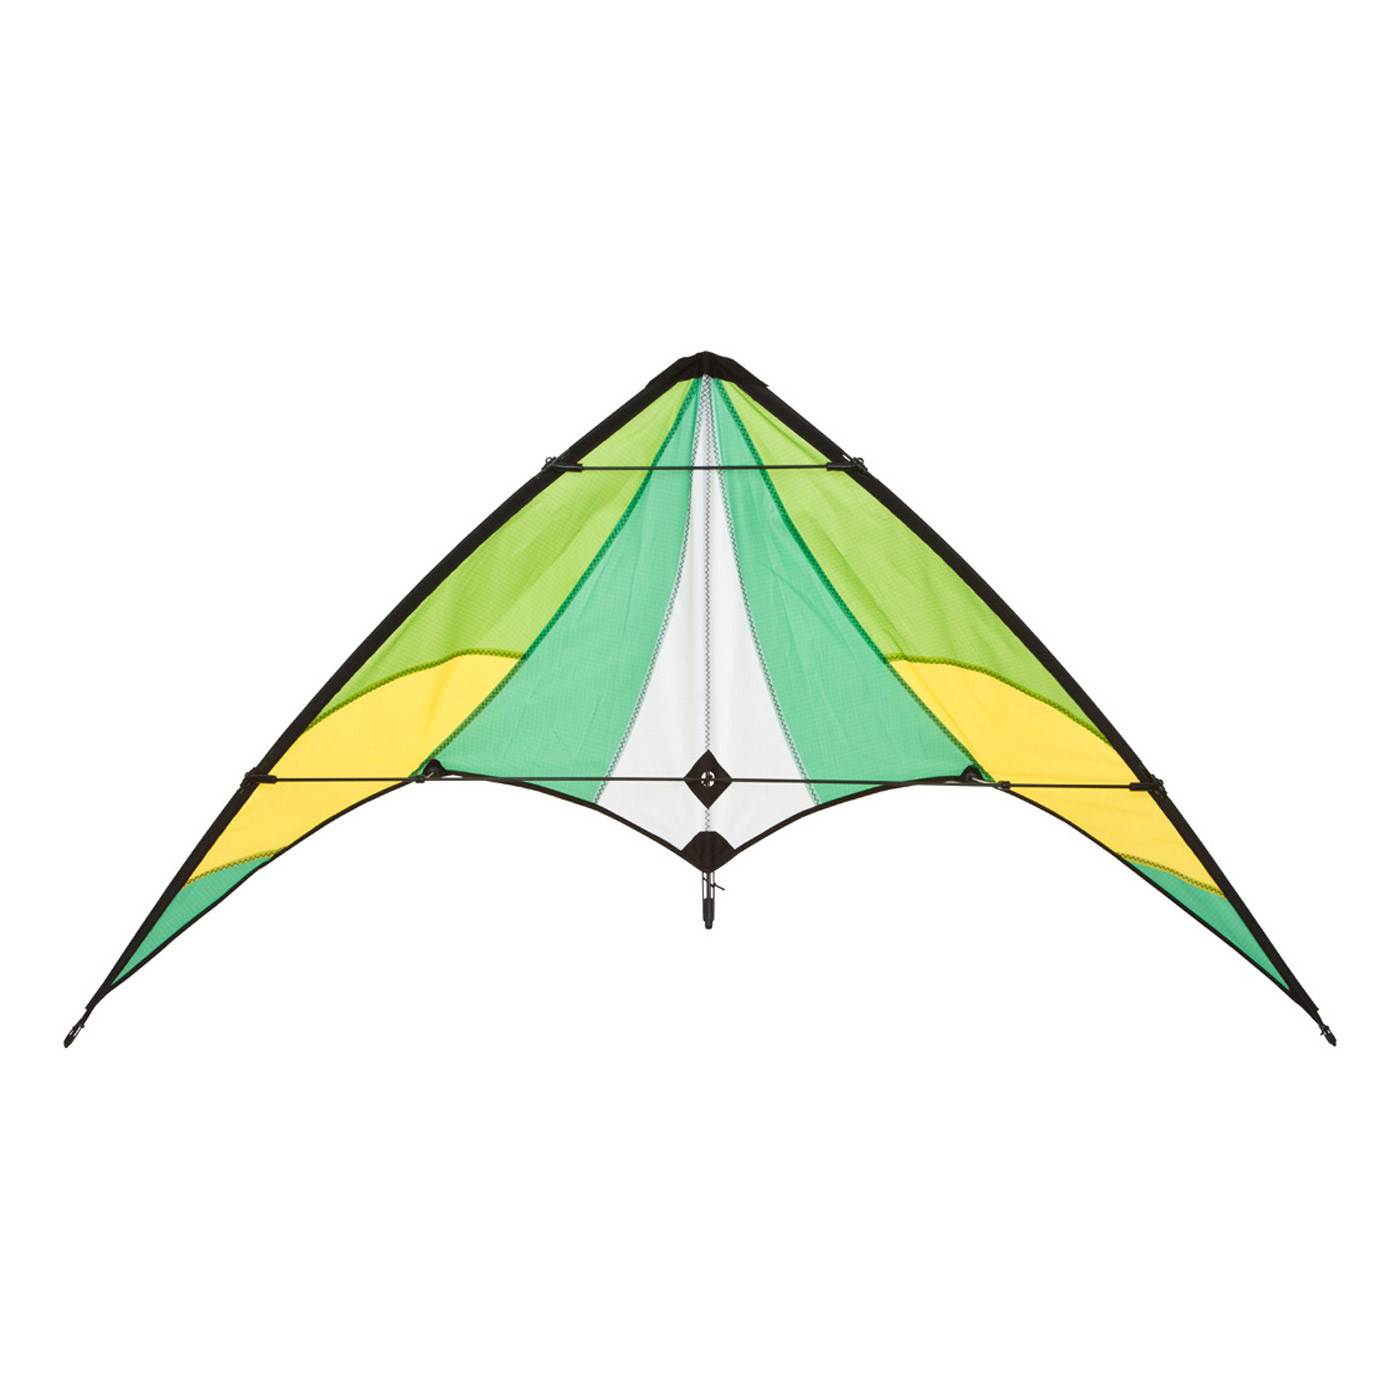 Stunt kite orion jungle r2f wind designs for Indoor kite design